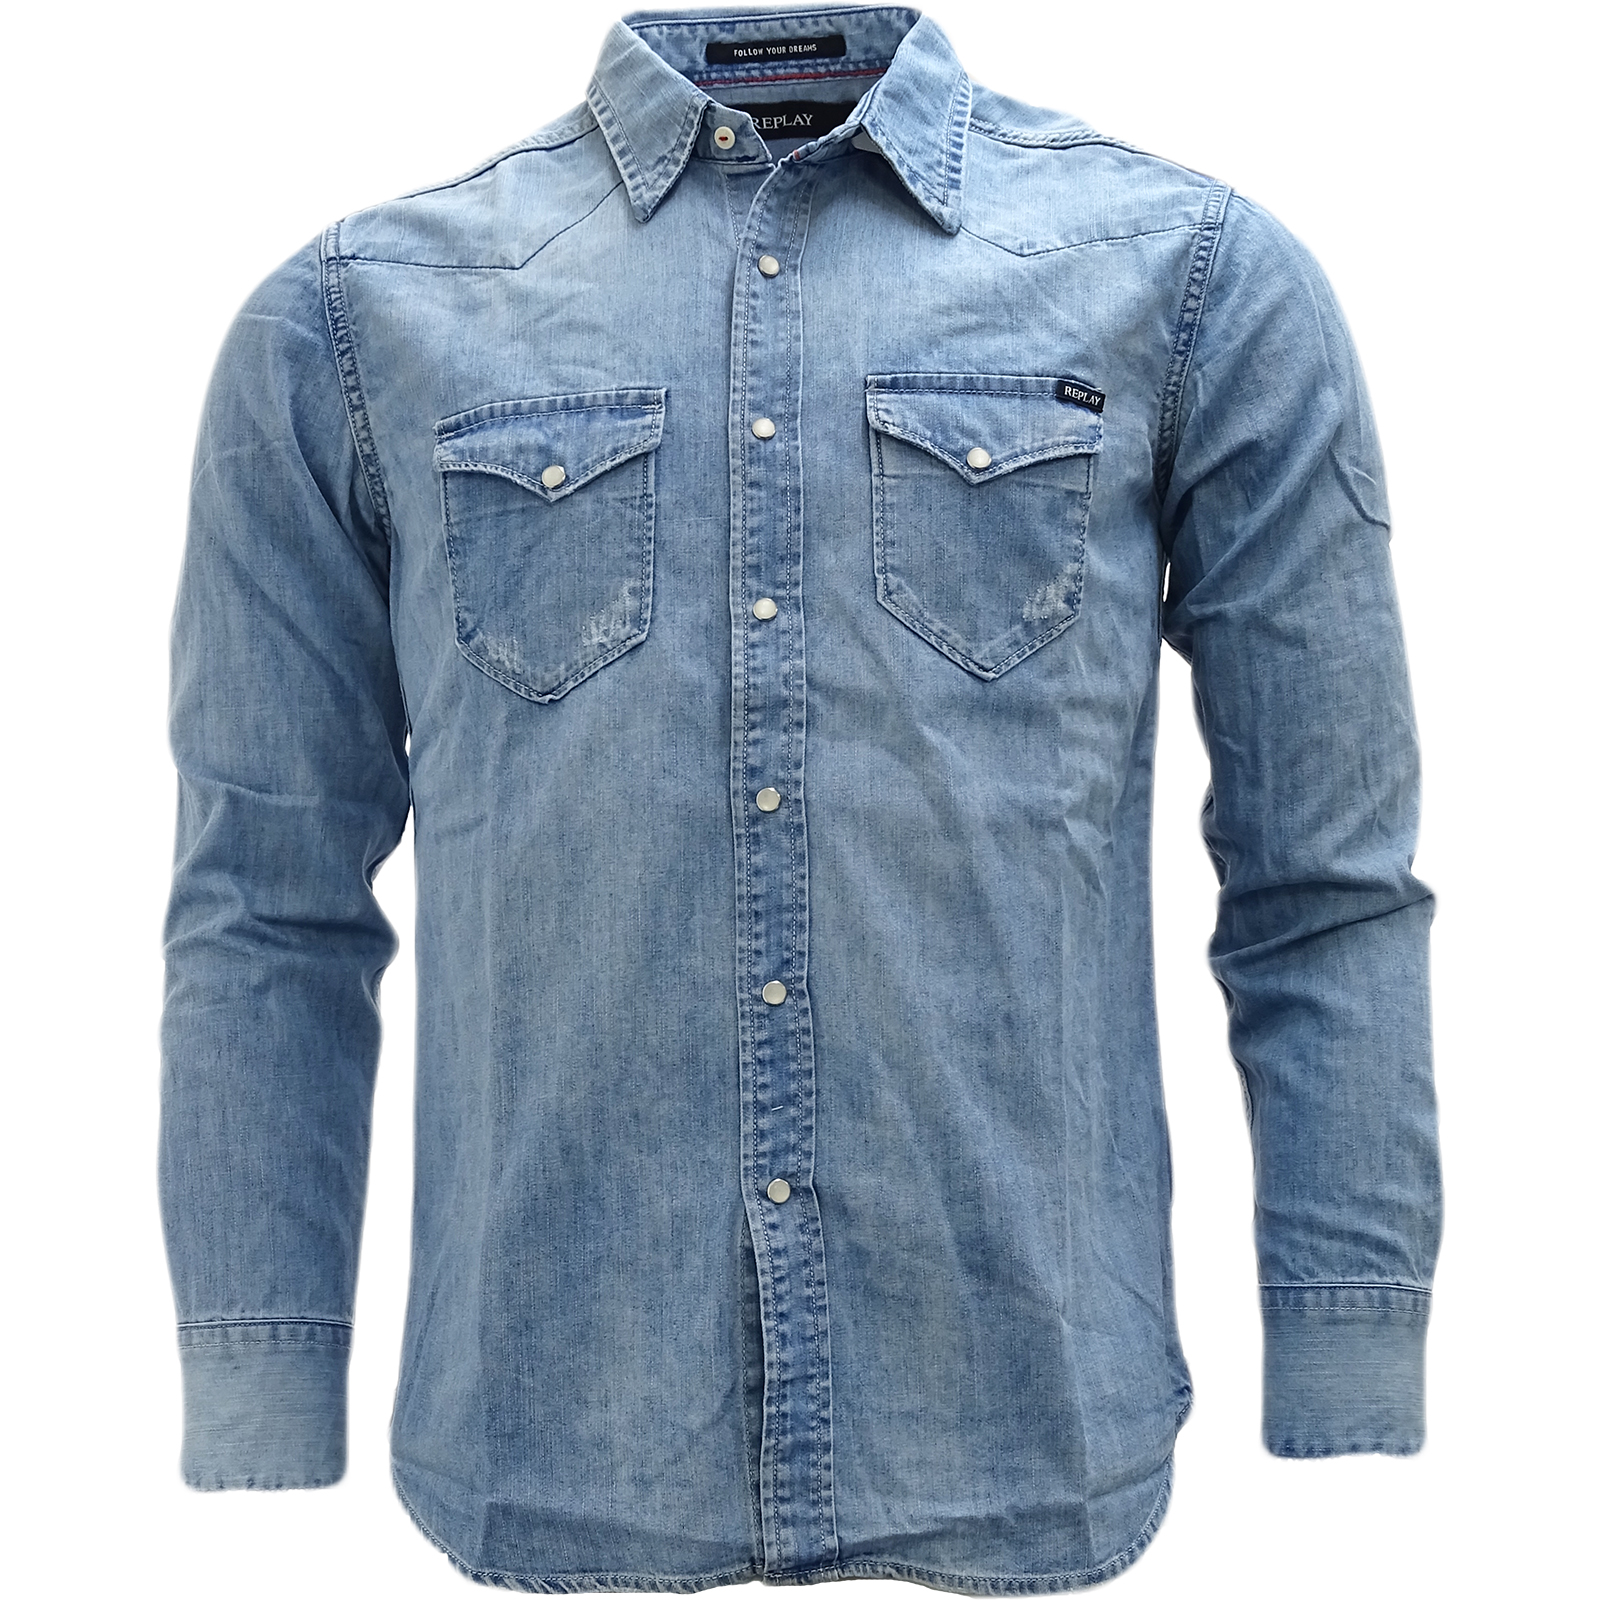 d692b91f69f5 Details about Replay Light Blue Western Style Denim Shirt - M4981-010